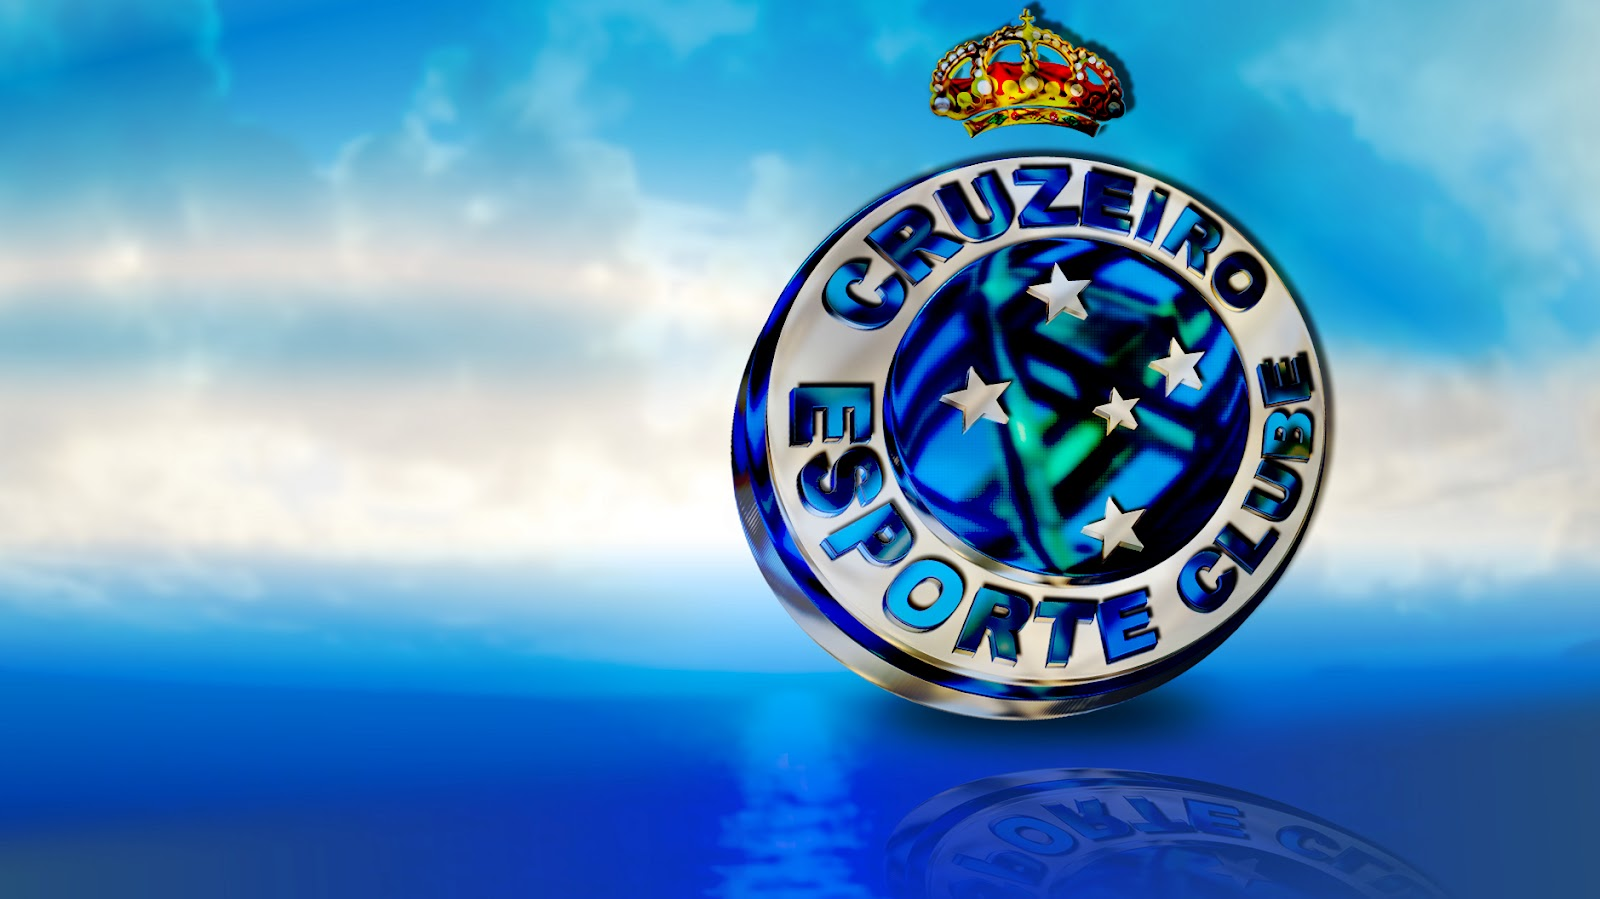 7a0337f629 Escudo Do Cruzeiro Esporte Clube Flickr Photo Sharing